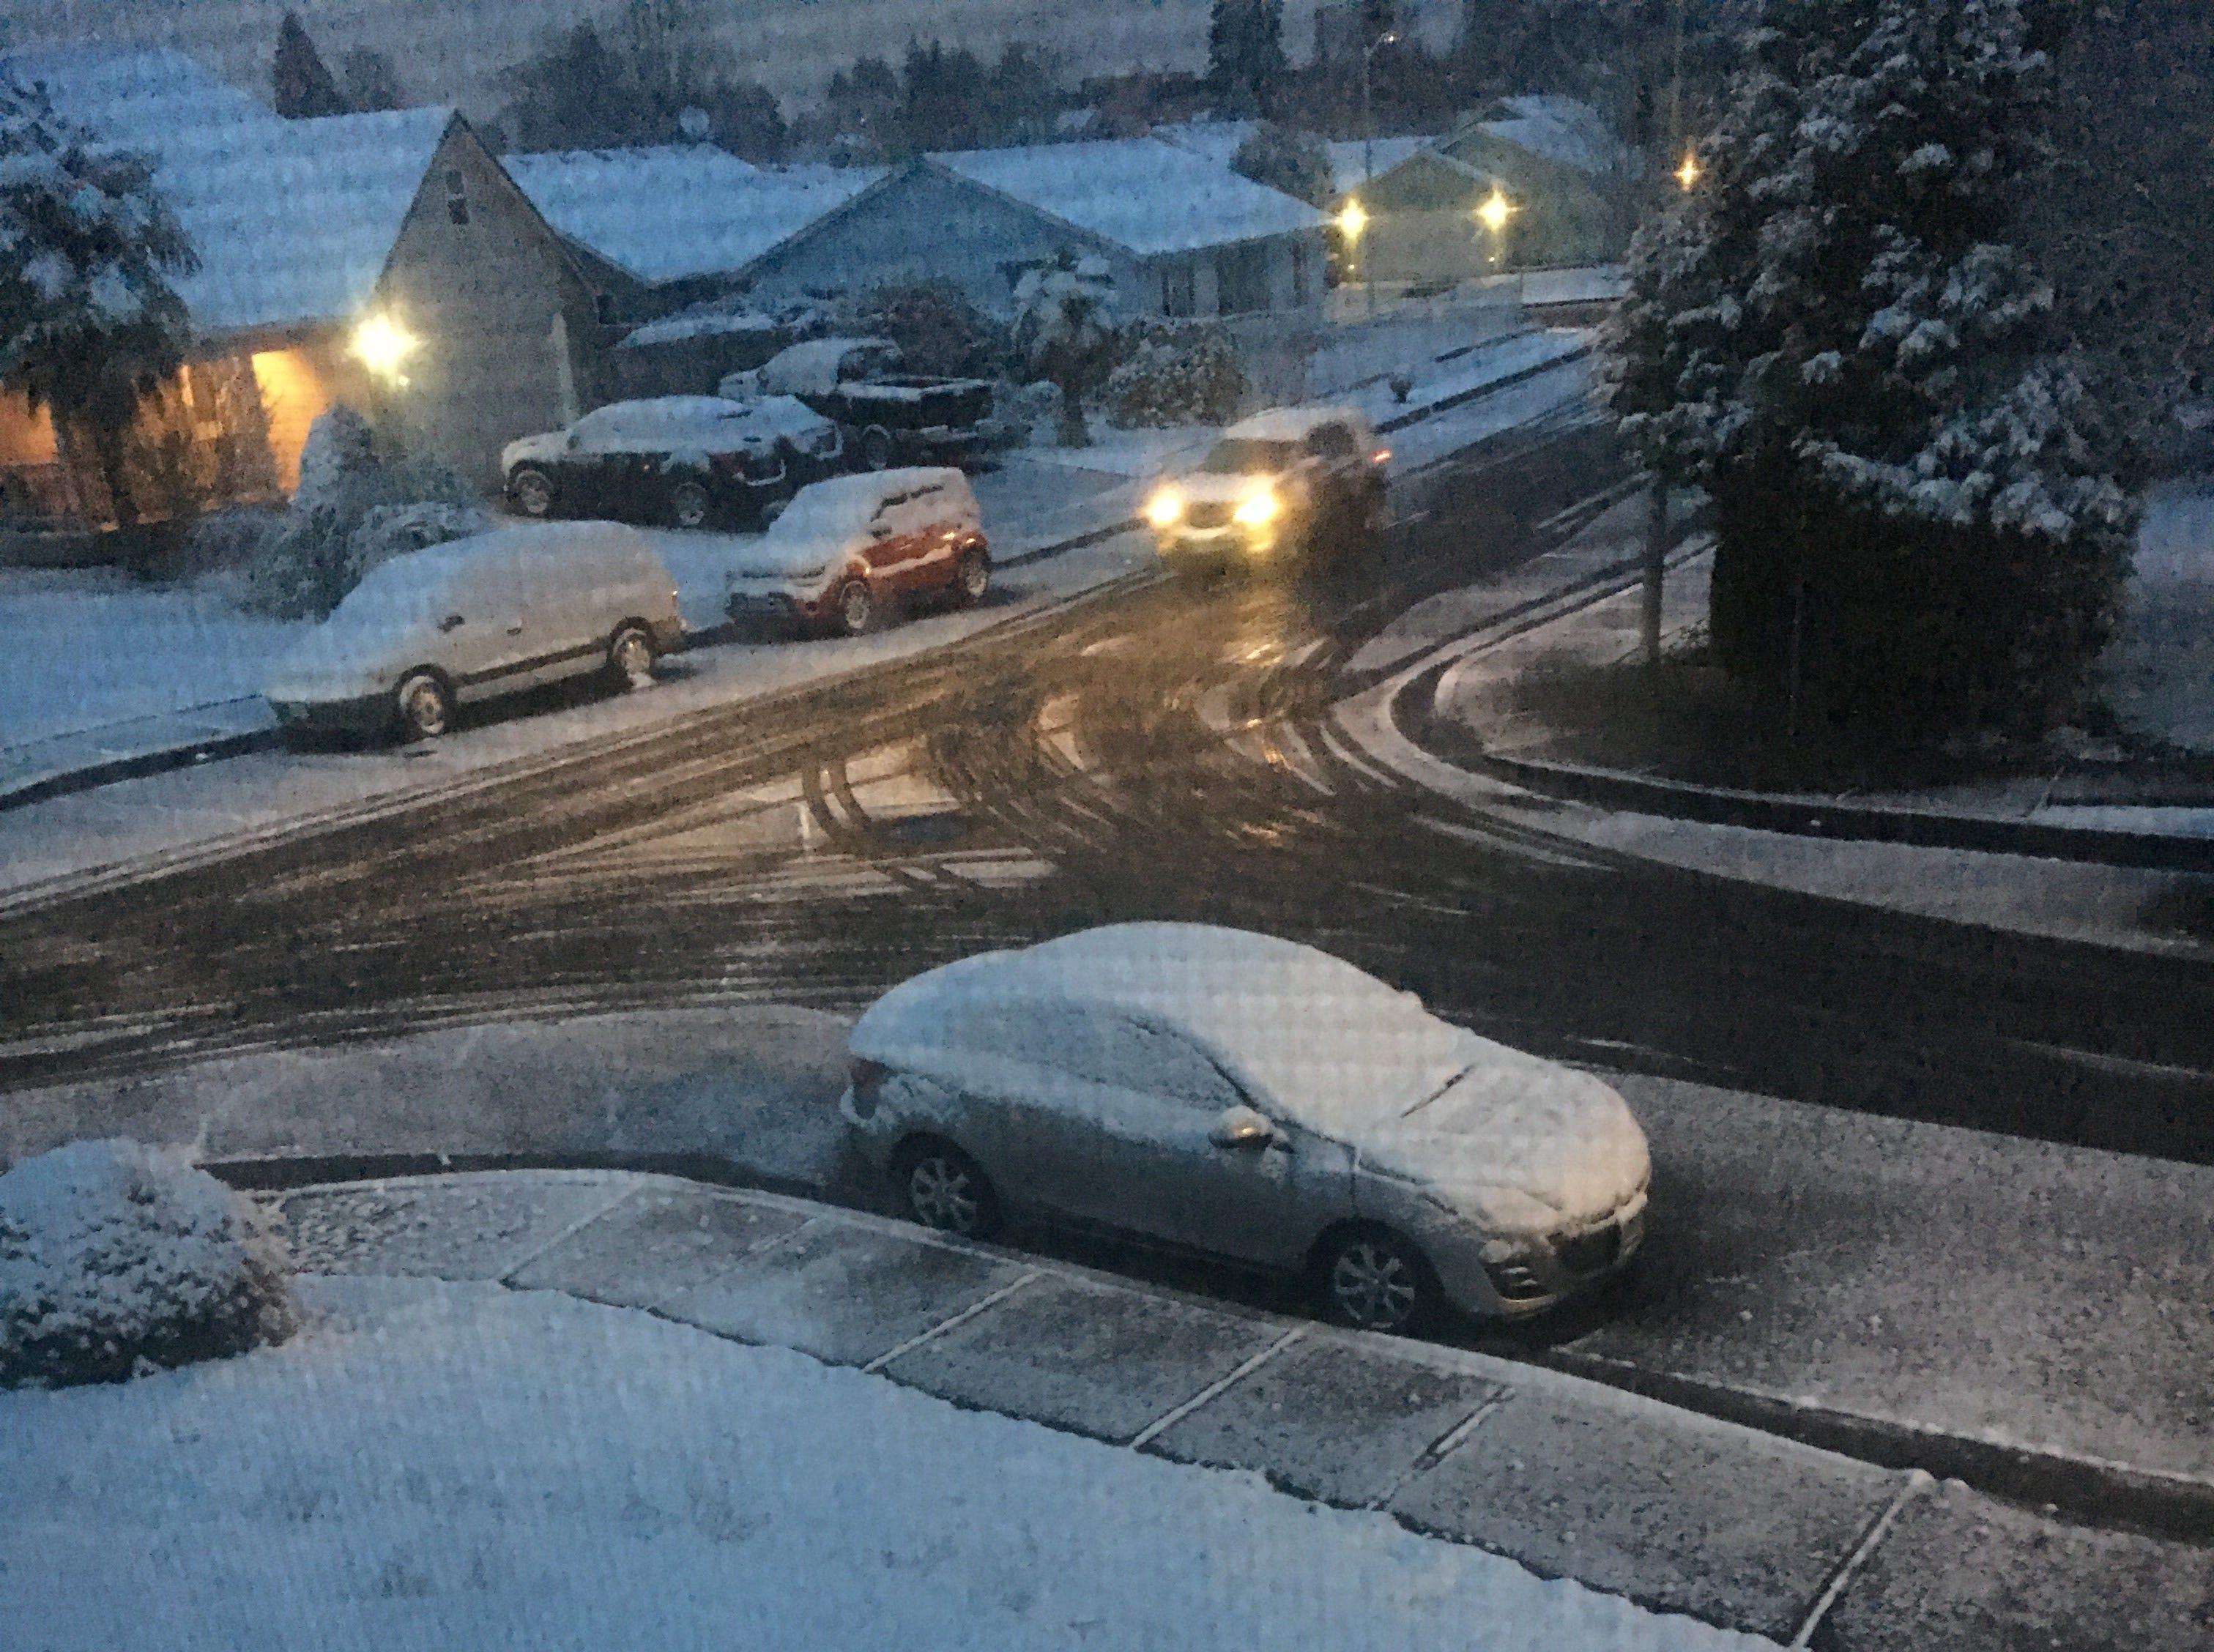 Snow blankets a northeast Salem neighborhood early Tuesday.